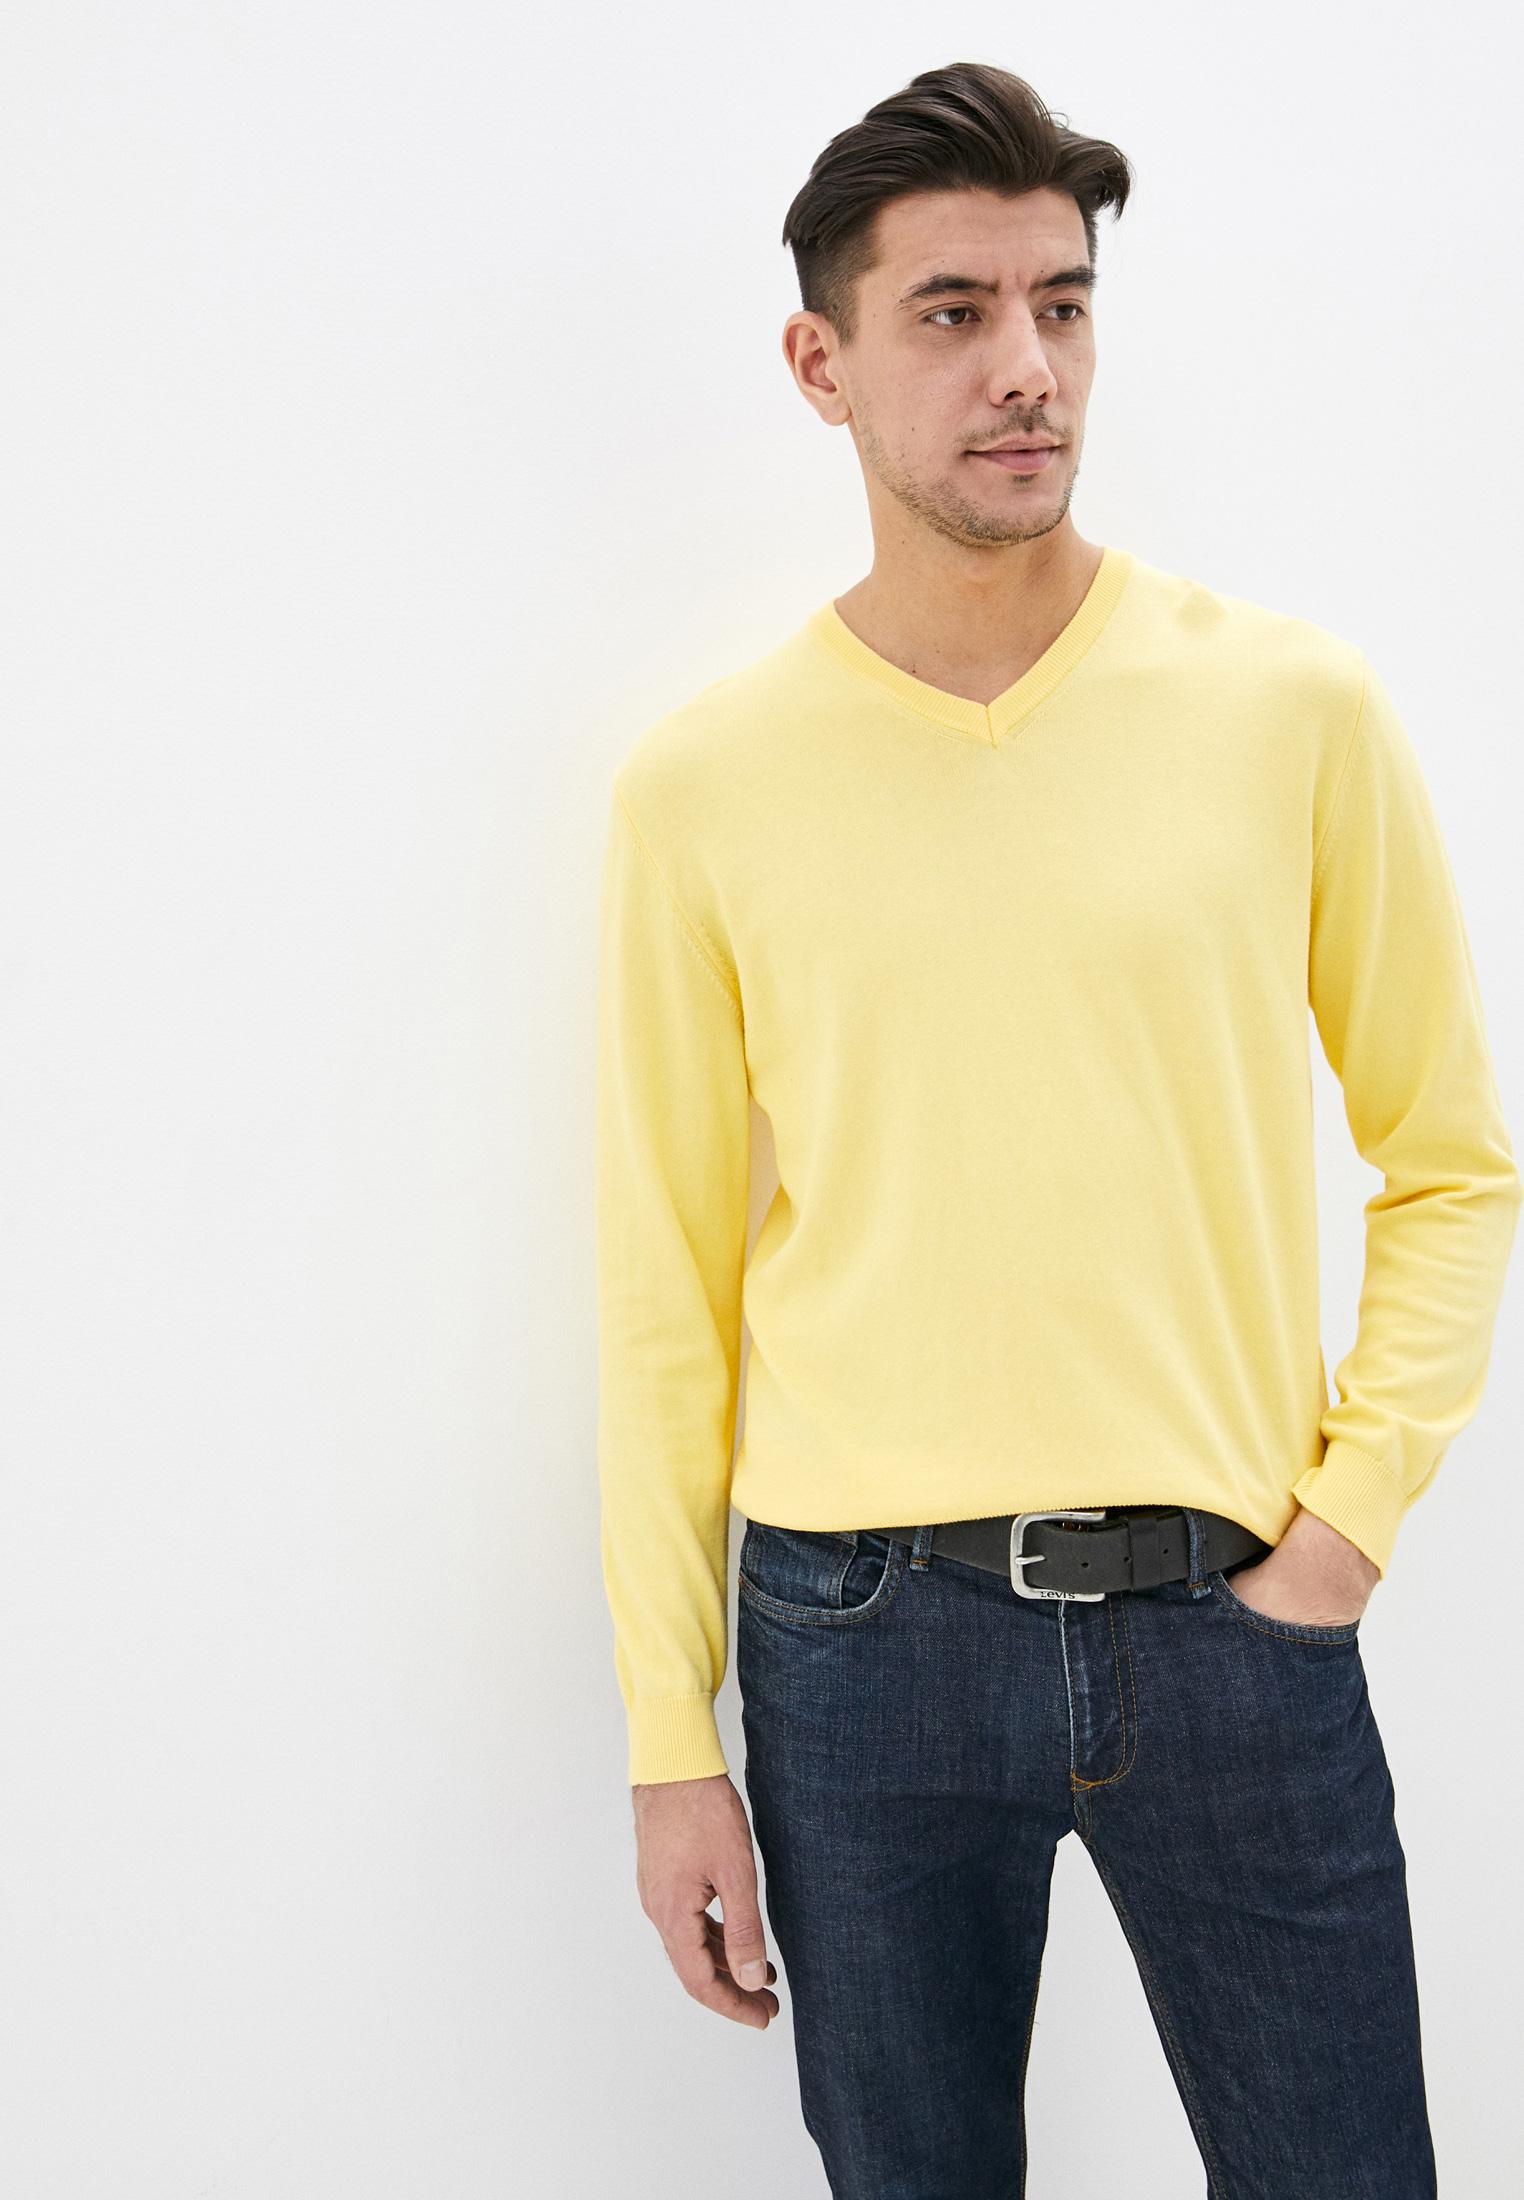 Пуловер United Colors of Benetton (Юнайтед Колорс оф Бенеттон) 1098U4486